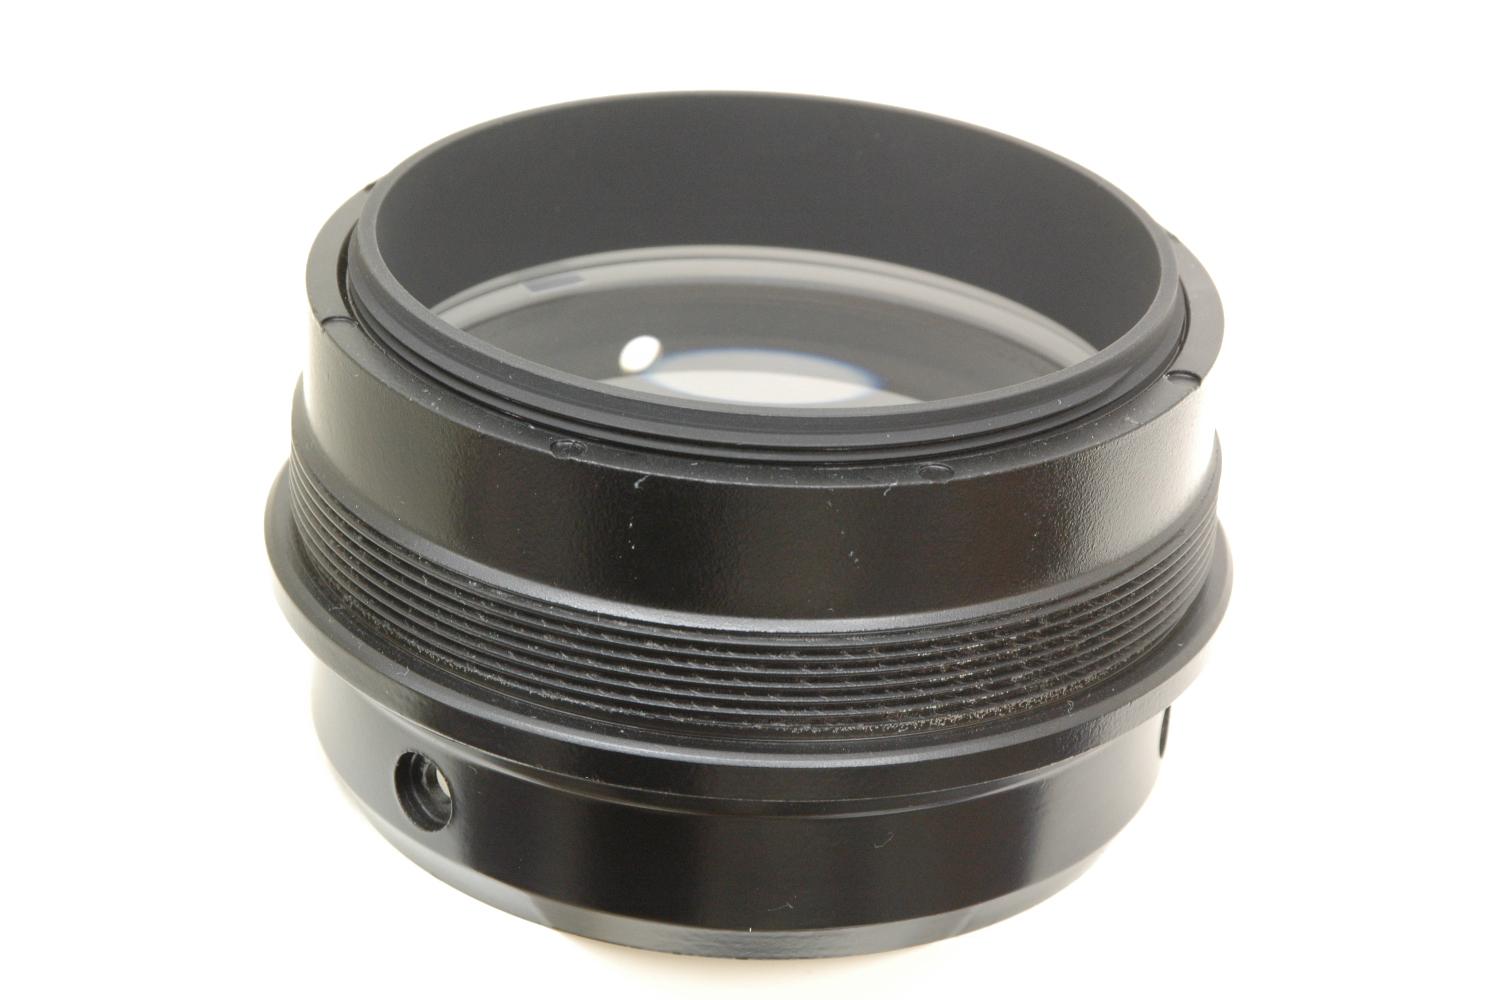 D80mmFL1000mmフルコートアクロマートレンズ金属セル付